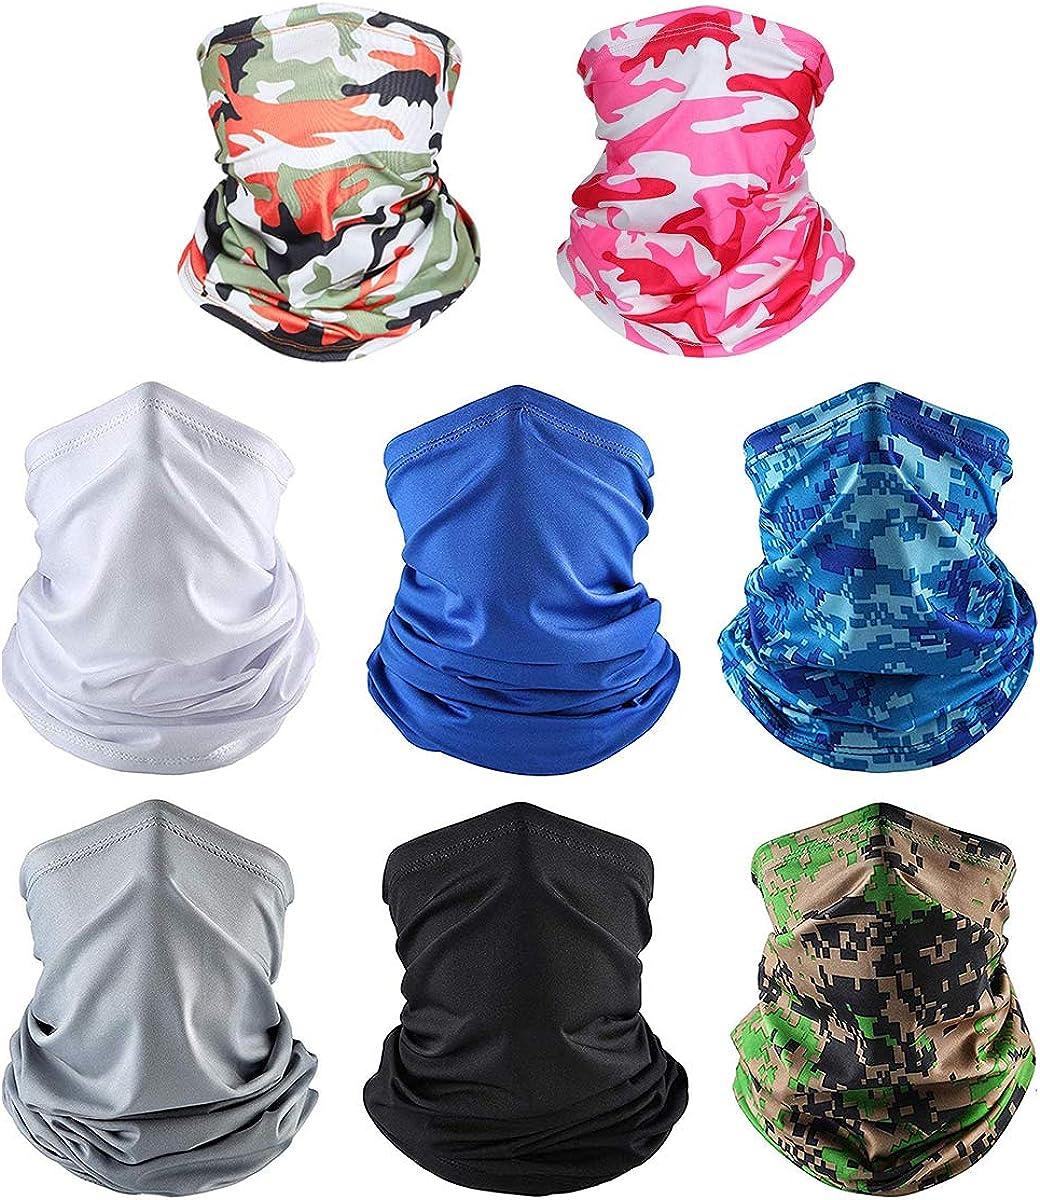 HiRAKU Free Shipping supreme New 8 PCS Balaclava Face Mask for Protecti Men UV Women Sun